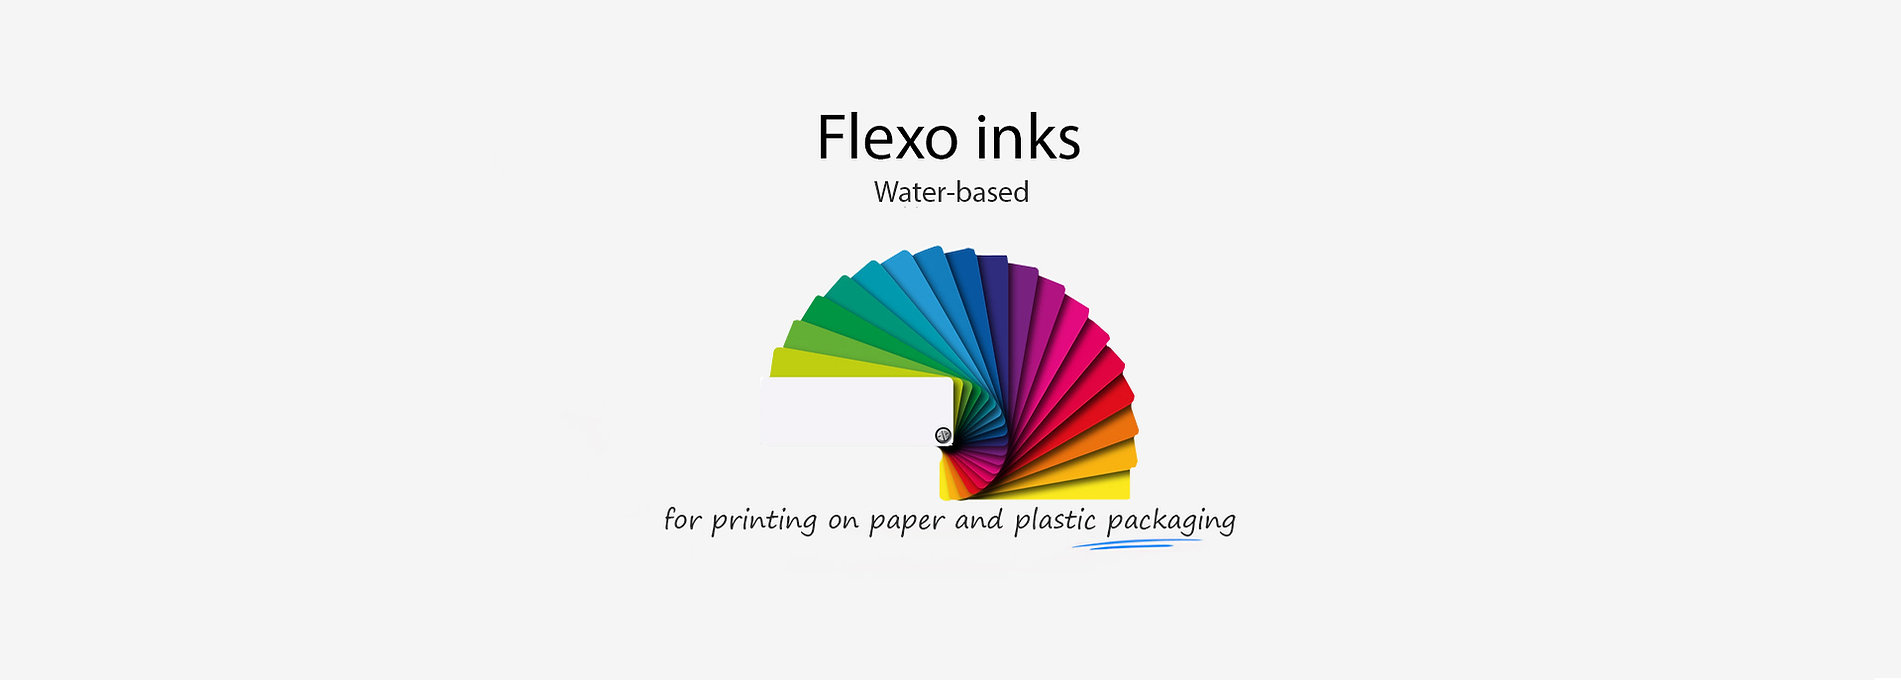 Flexo inks on water-based